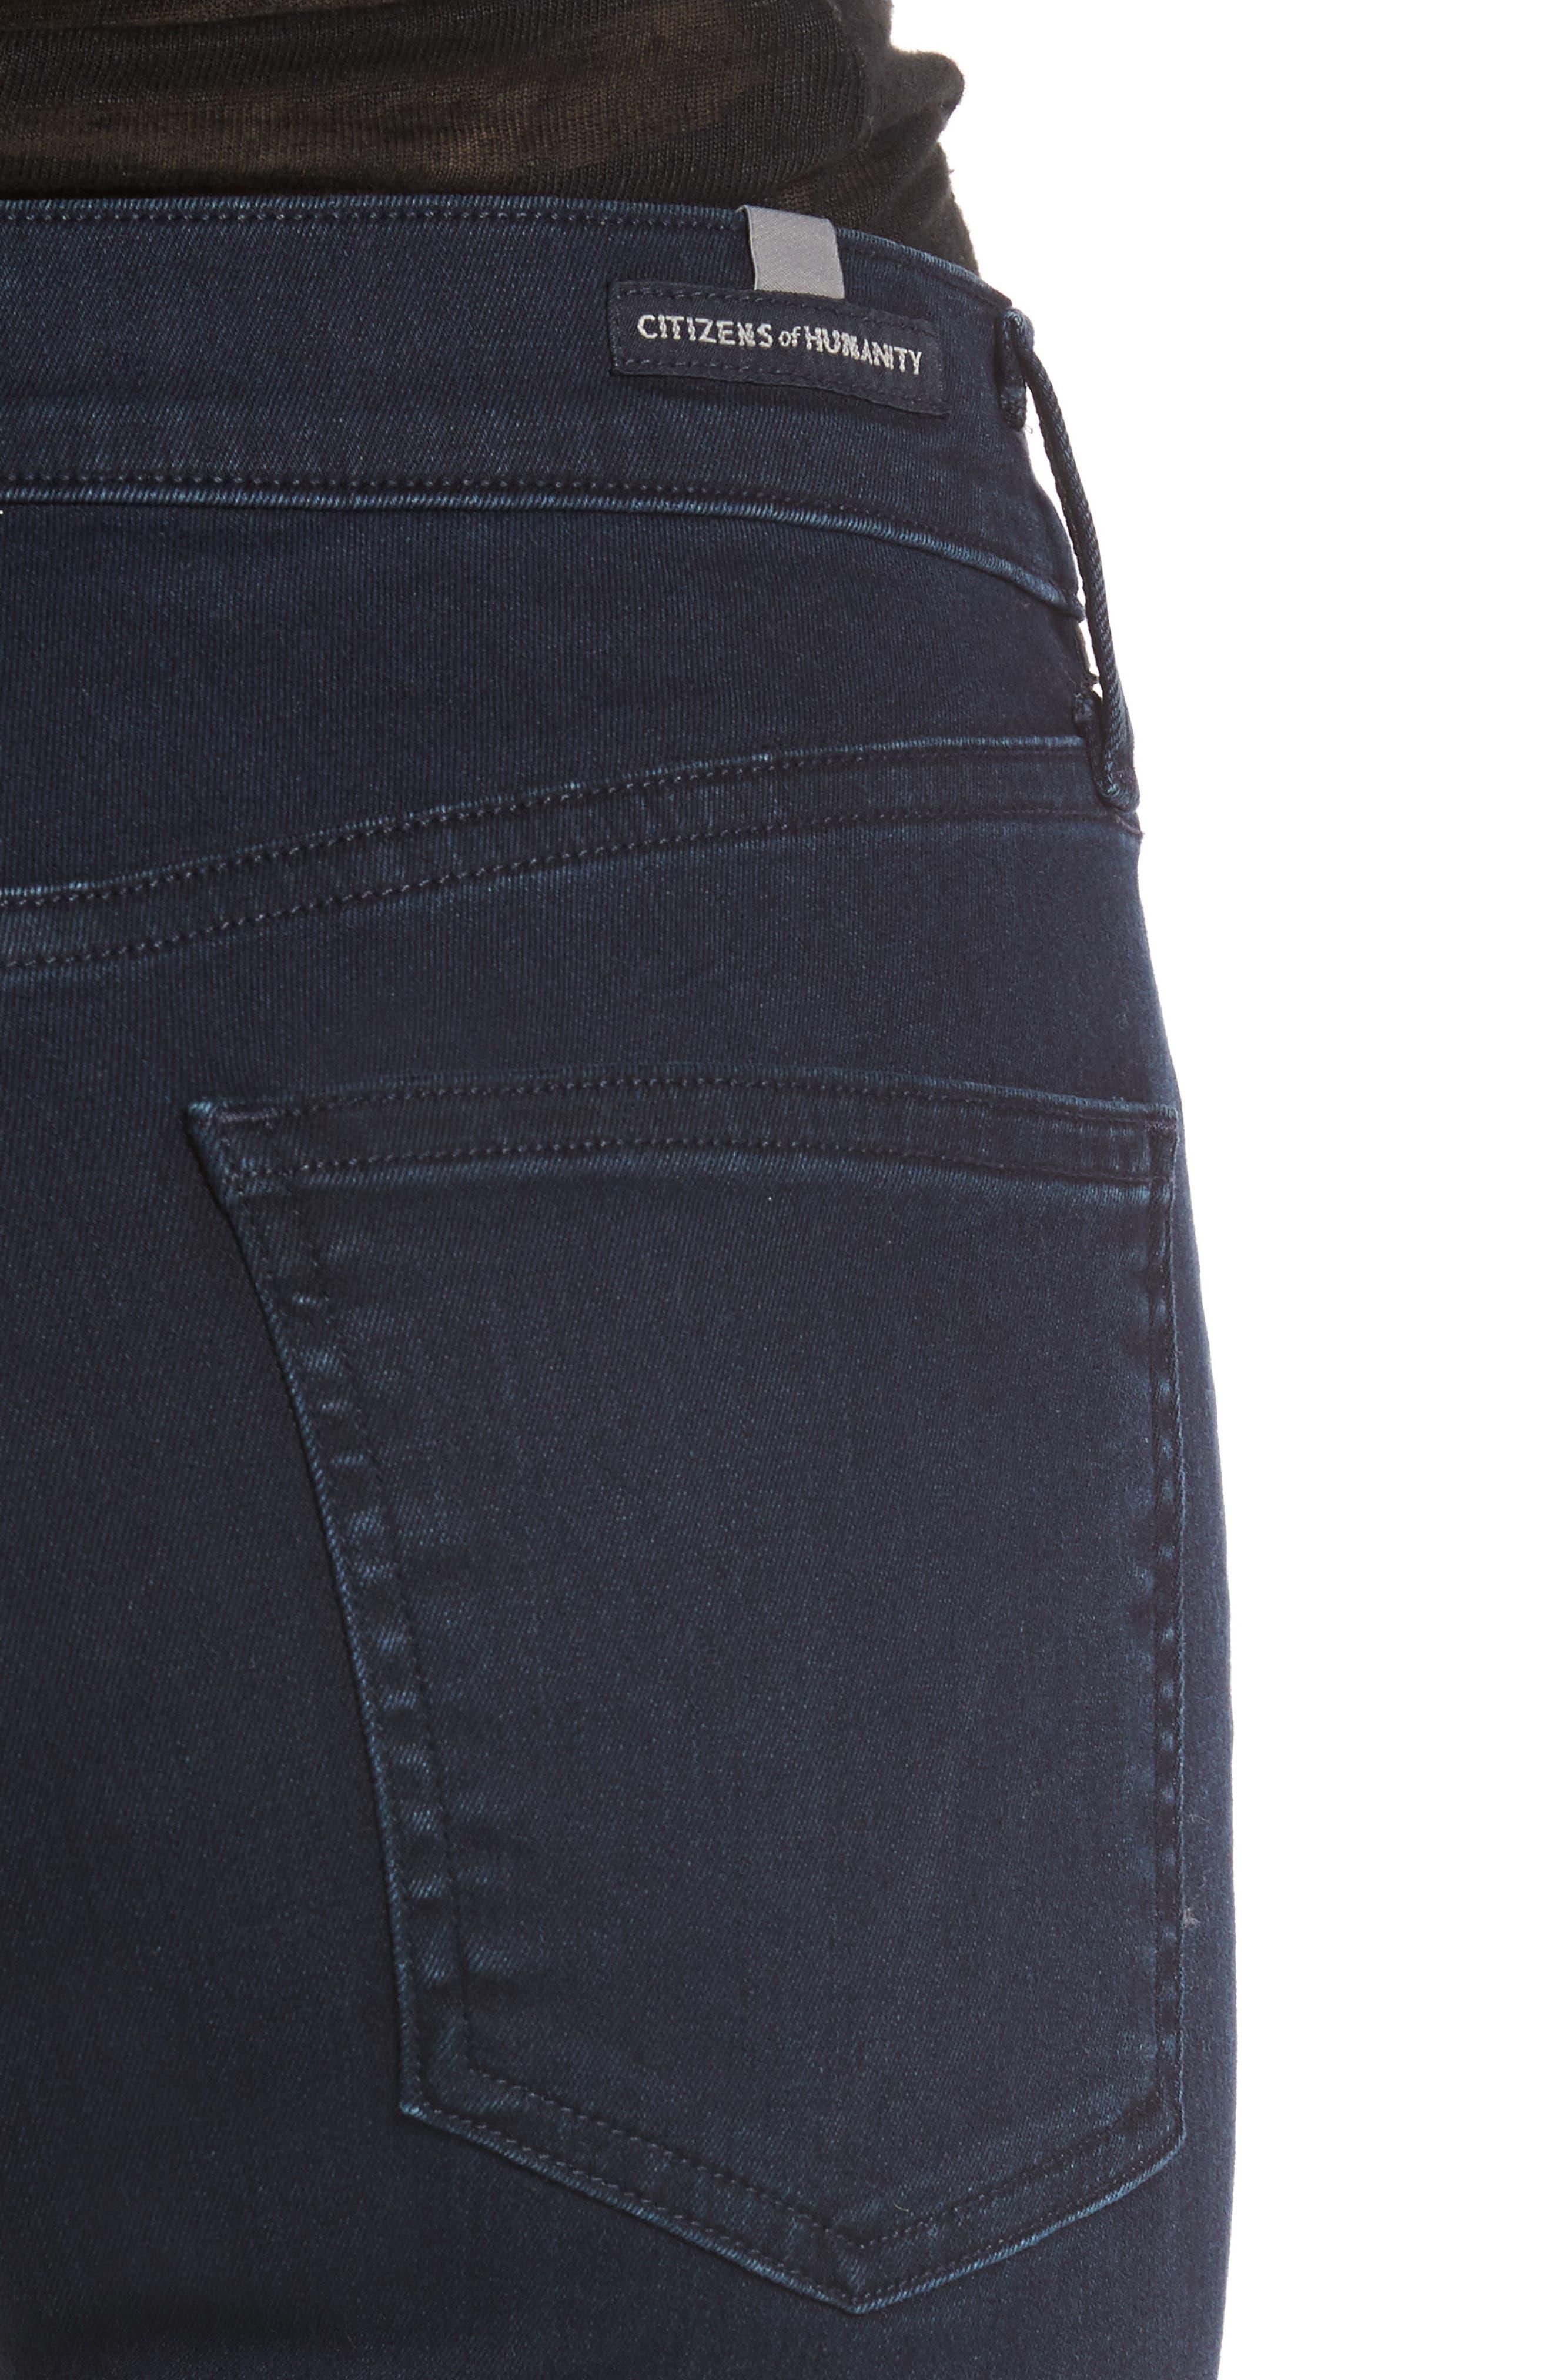 Rocket High Waist Skinny Jeans,                             Alternate thumbnail 4, color,                             Ozone Ink